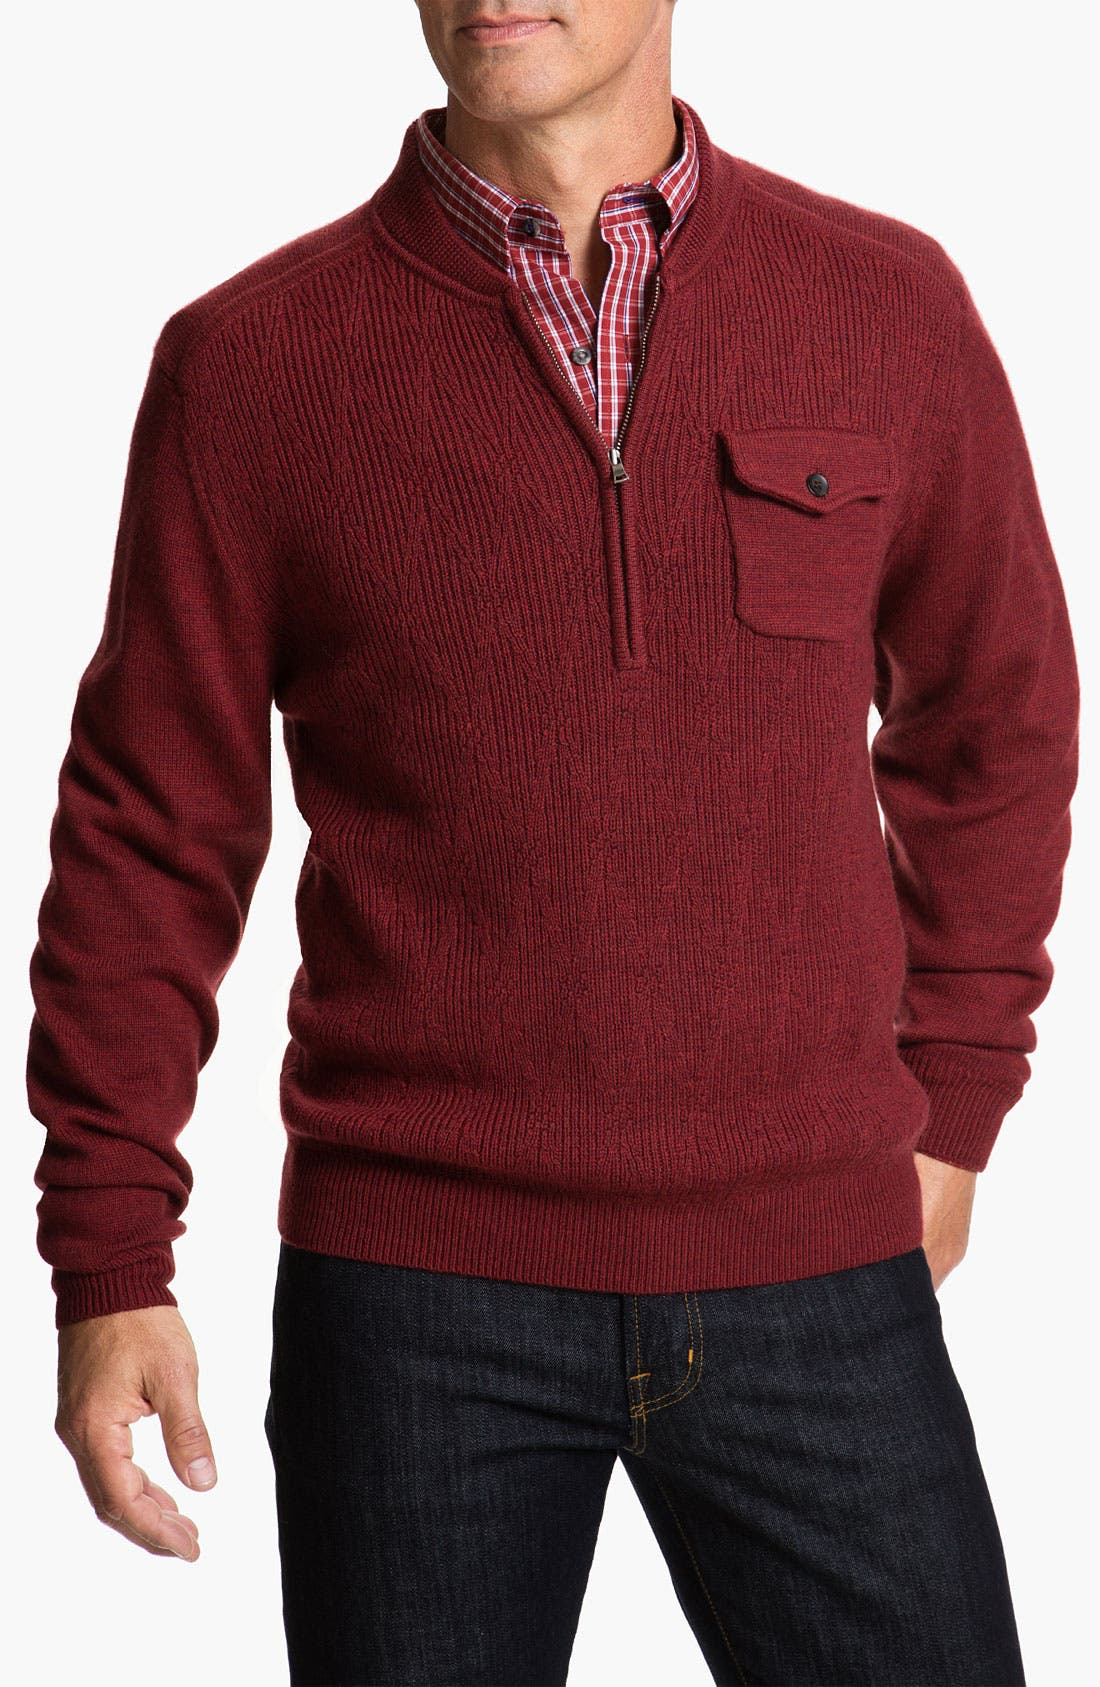 Alternate Image 1 Selected - Cutter & Buck 'Brandywine' Argyle Textured Merino Wool Sweater (Big & Tall)